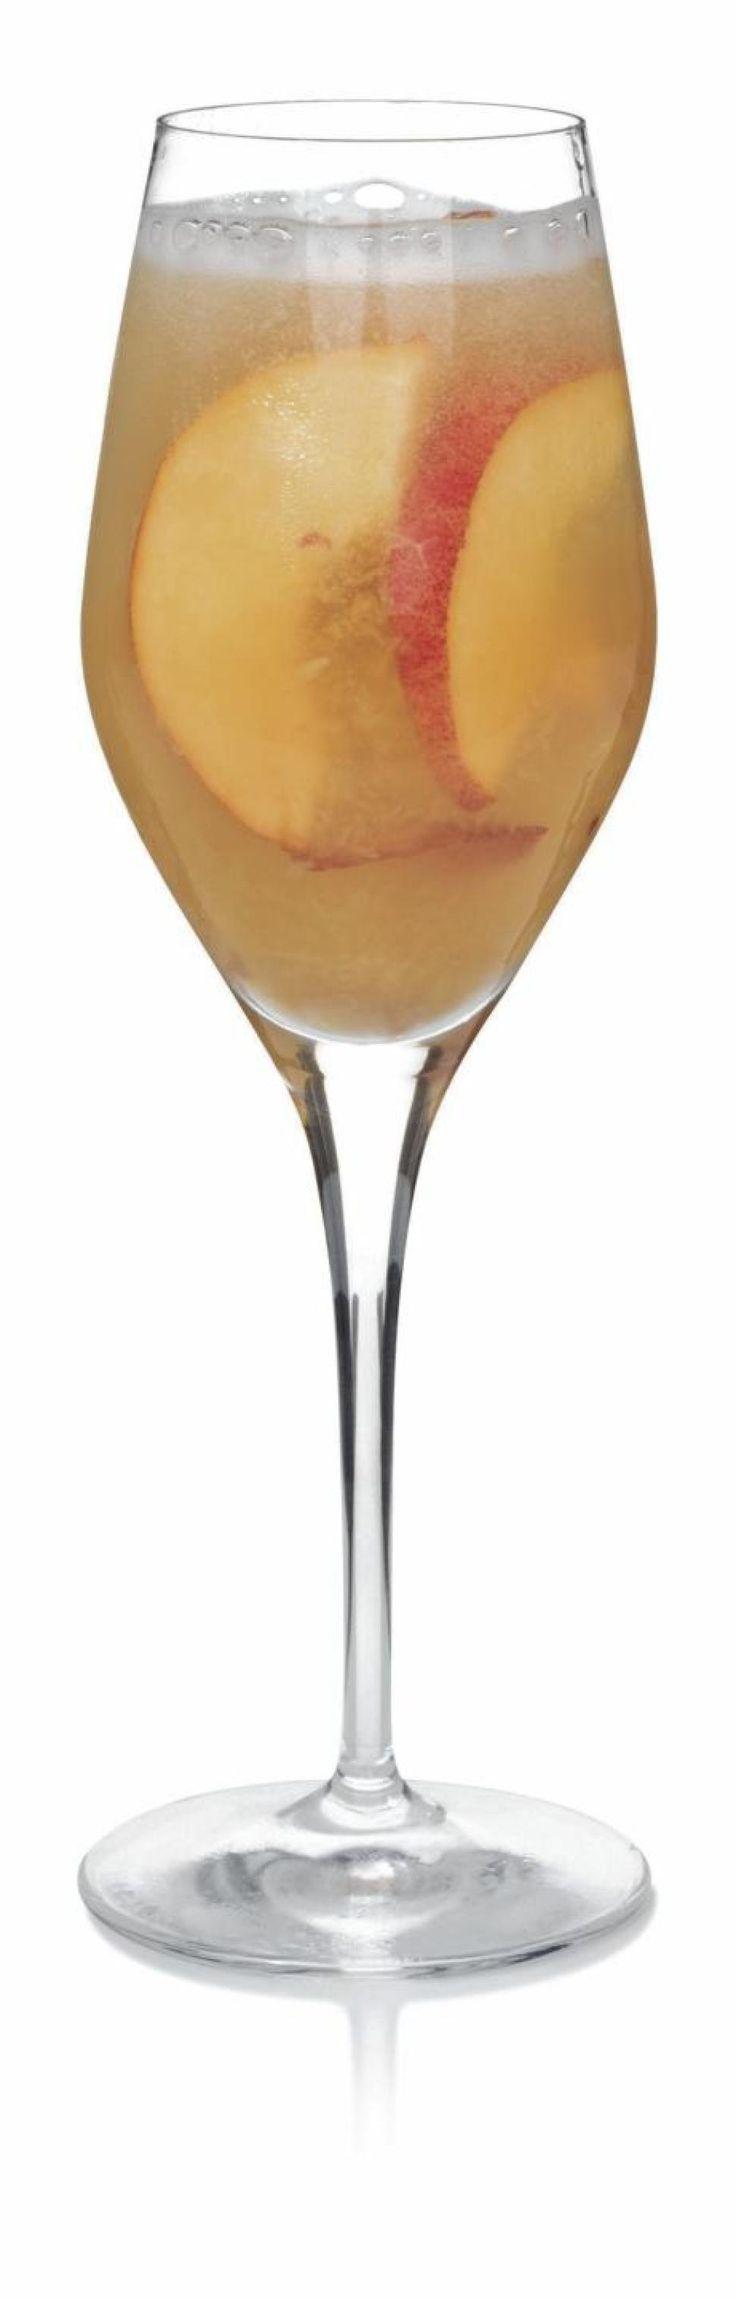 Slugger's Big Apple Sangria 1 bottle white wine 1 Red Delicious Apple, sliced 1/2 bottle chilled champagne